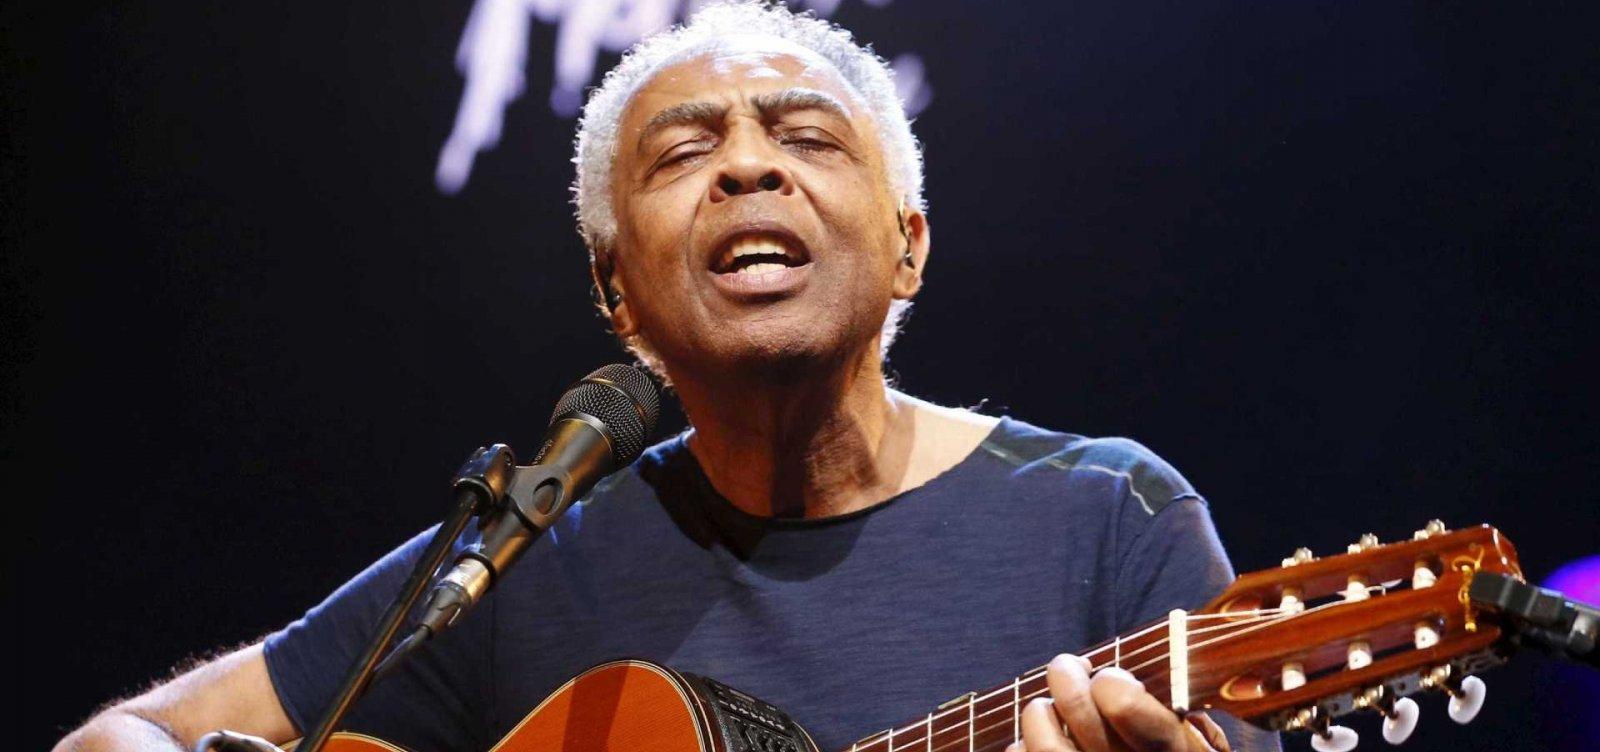 Cantor Gilberto Gil se apresenta na festa literária de Marechal Deodoro